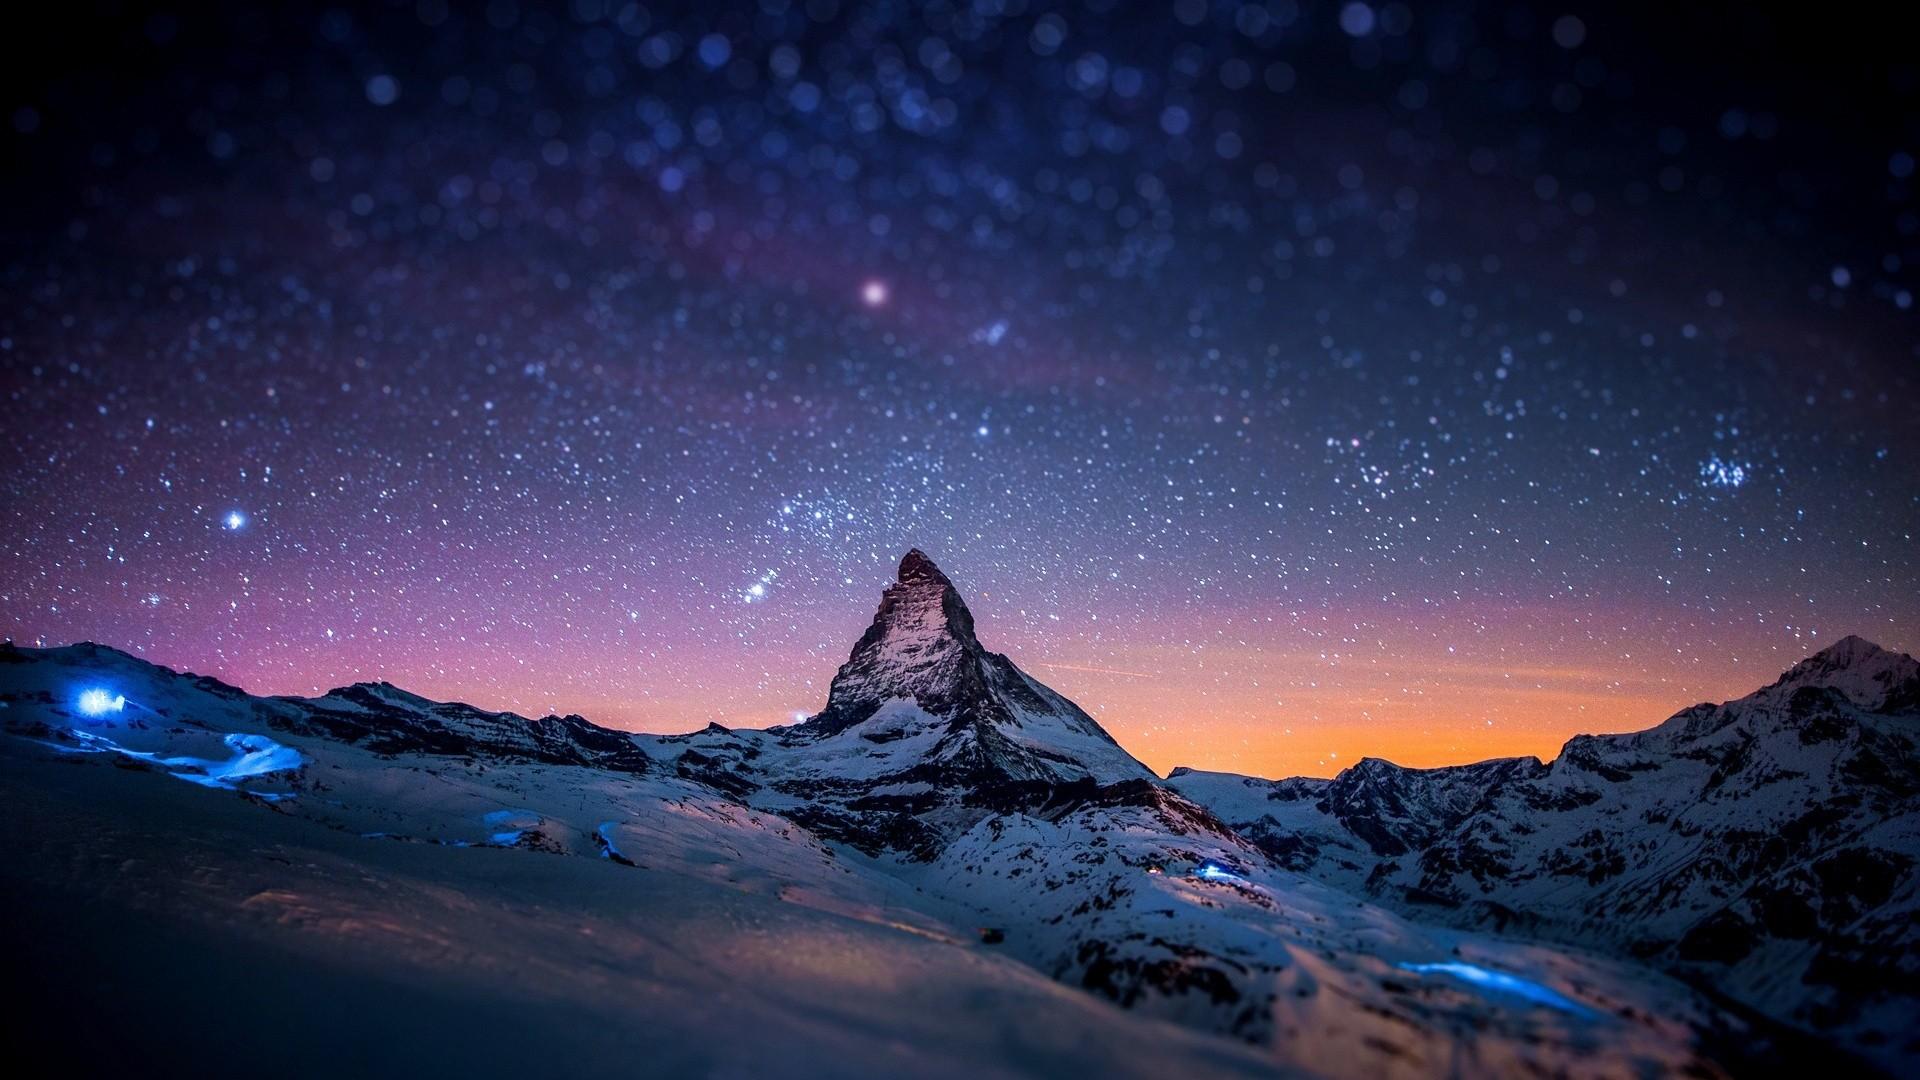 wallpaperrs.com uploads nature  earth-sky-stars-space-mountain-galaxy-snow-artistic-photography-hd-cool-dark-matterhorn-phenomenal-w-142977772730.jpg  …